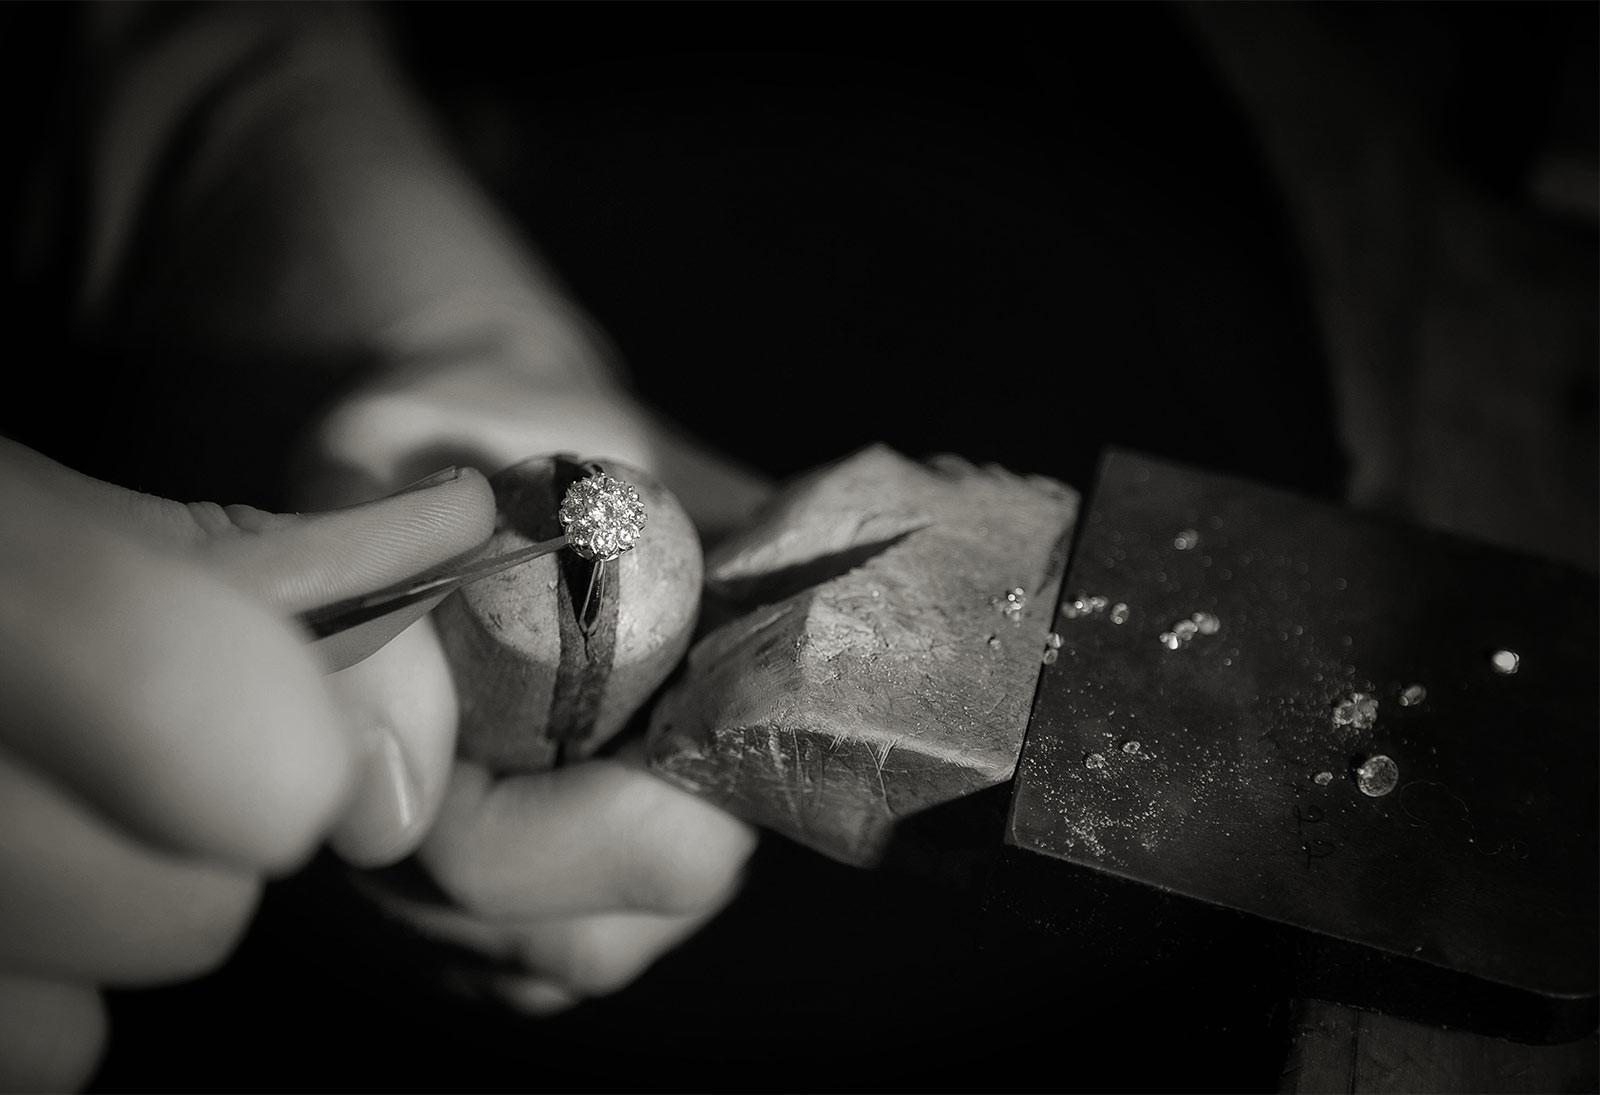 7. Set the stones. Setting a bespoke fine quality diamond ring or item of custom jewellery